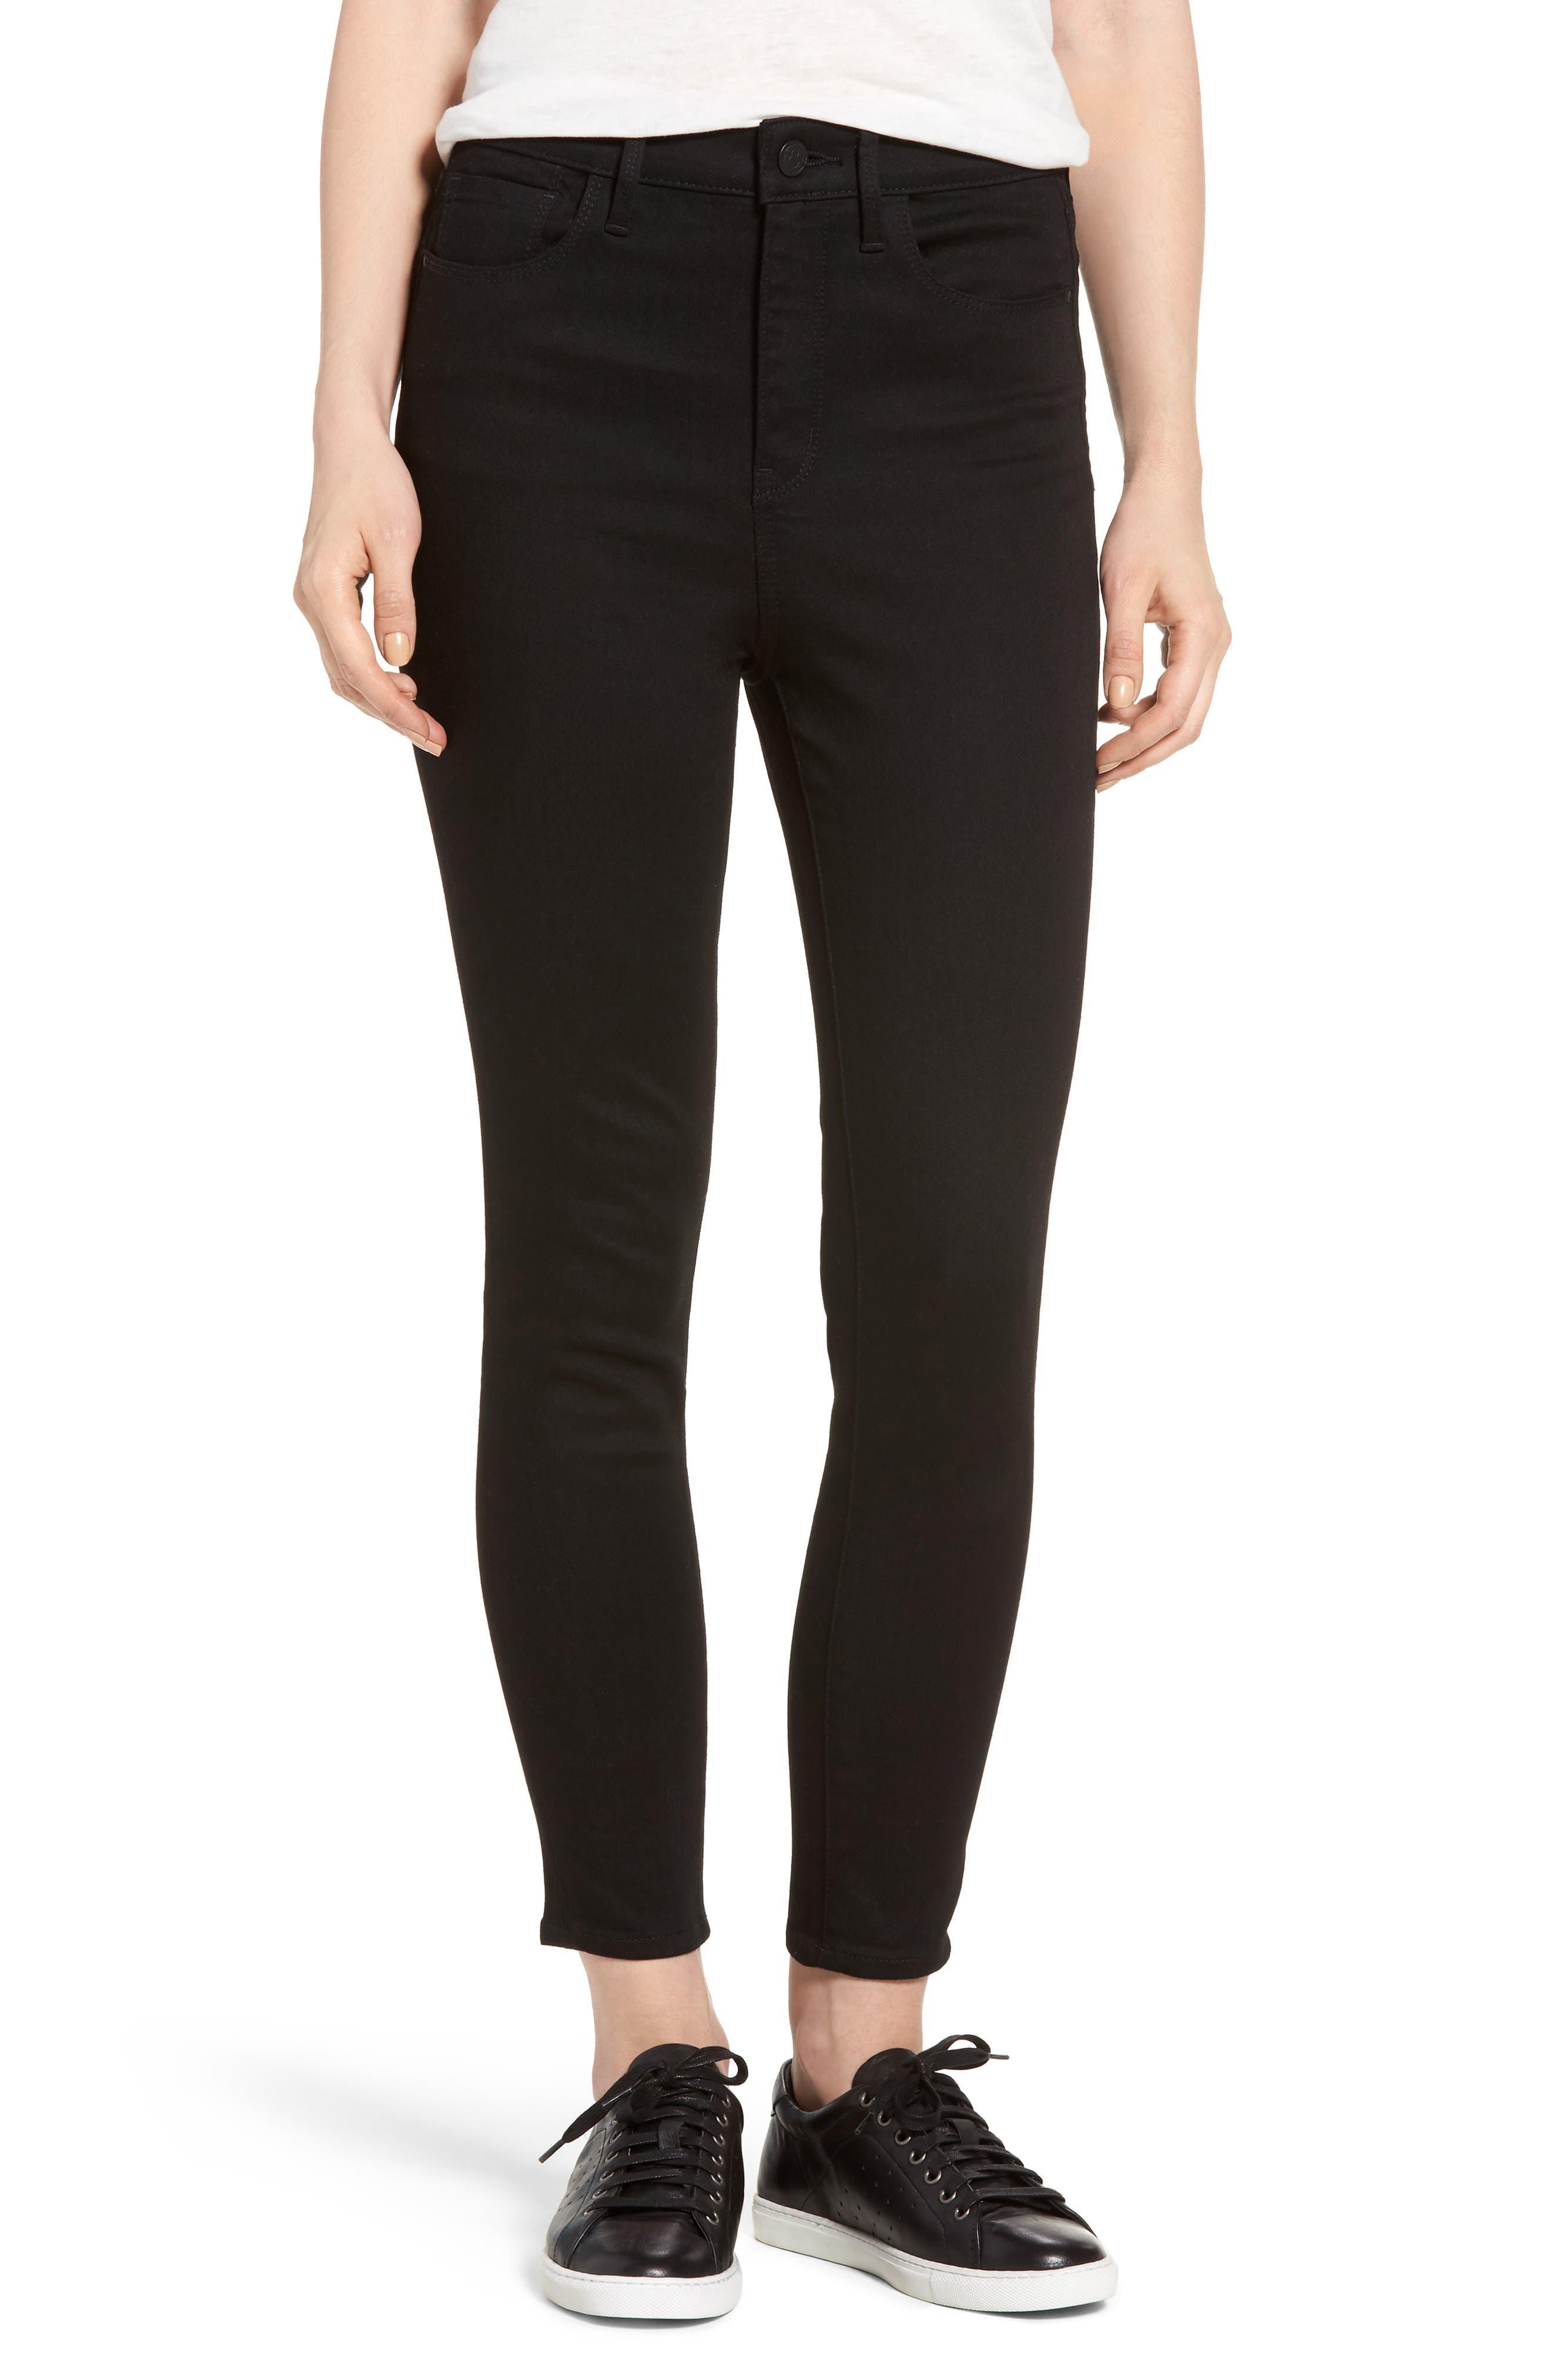 TREASURE & BOND High Waist Crop Skinny Jeans